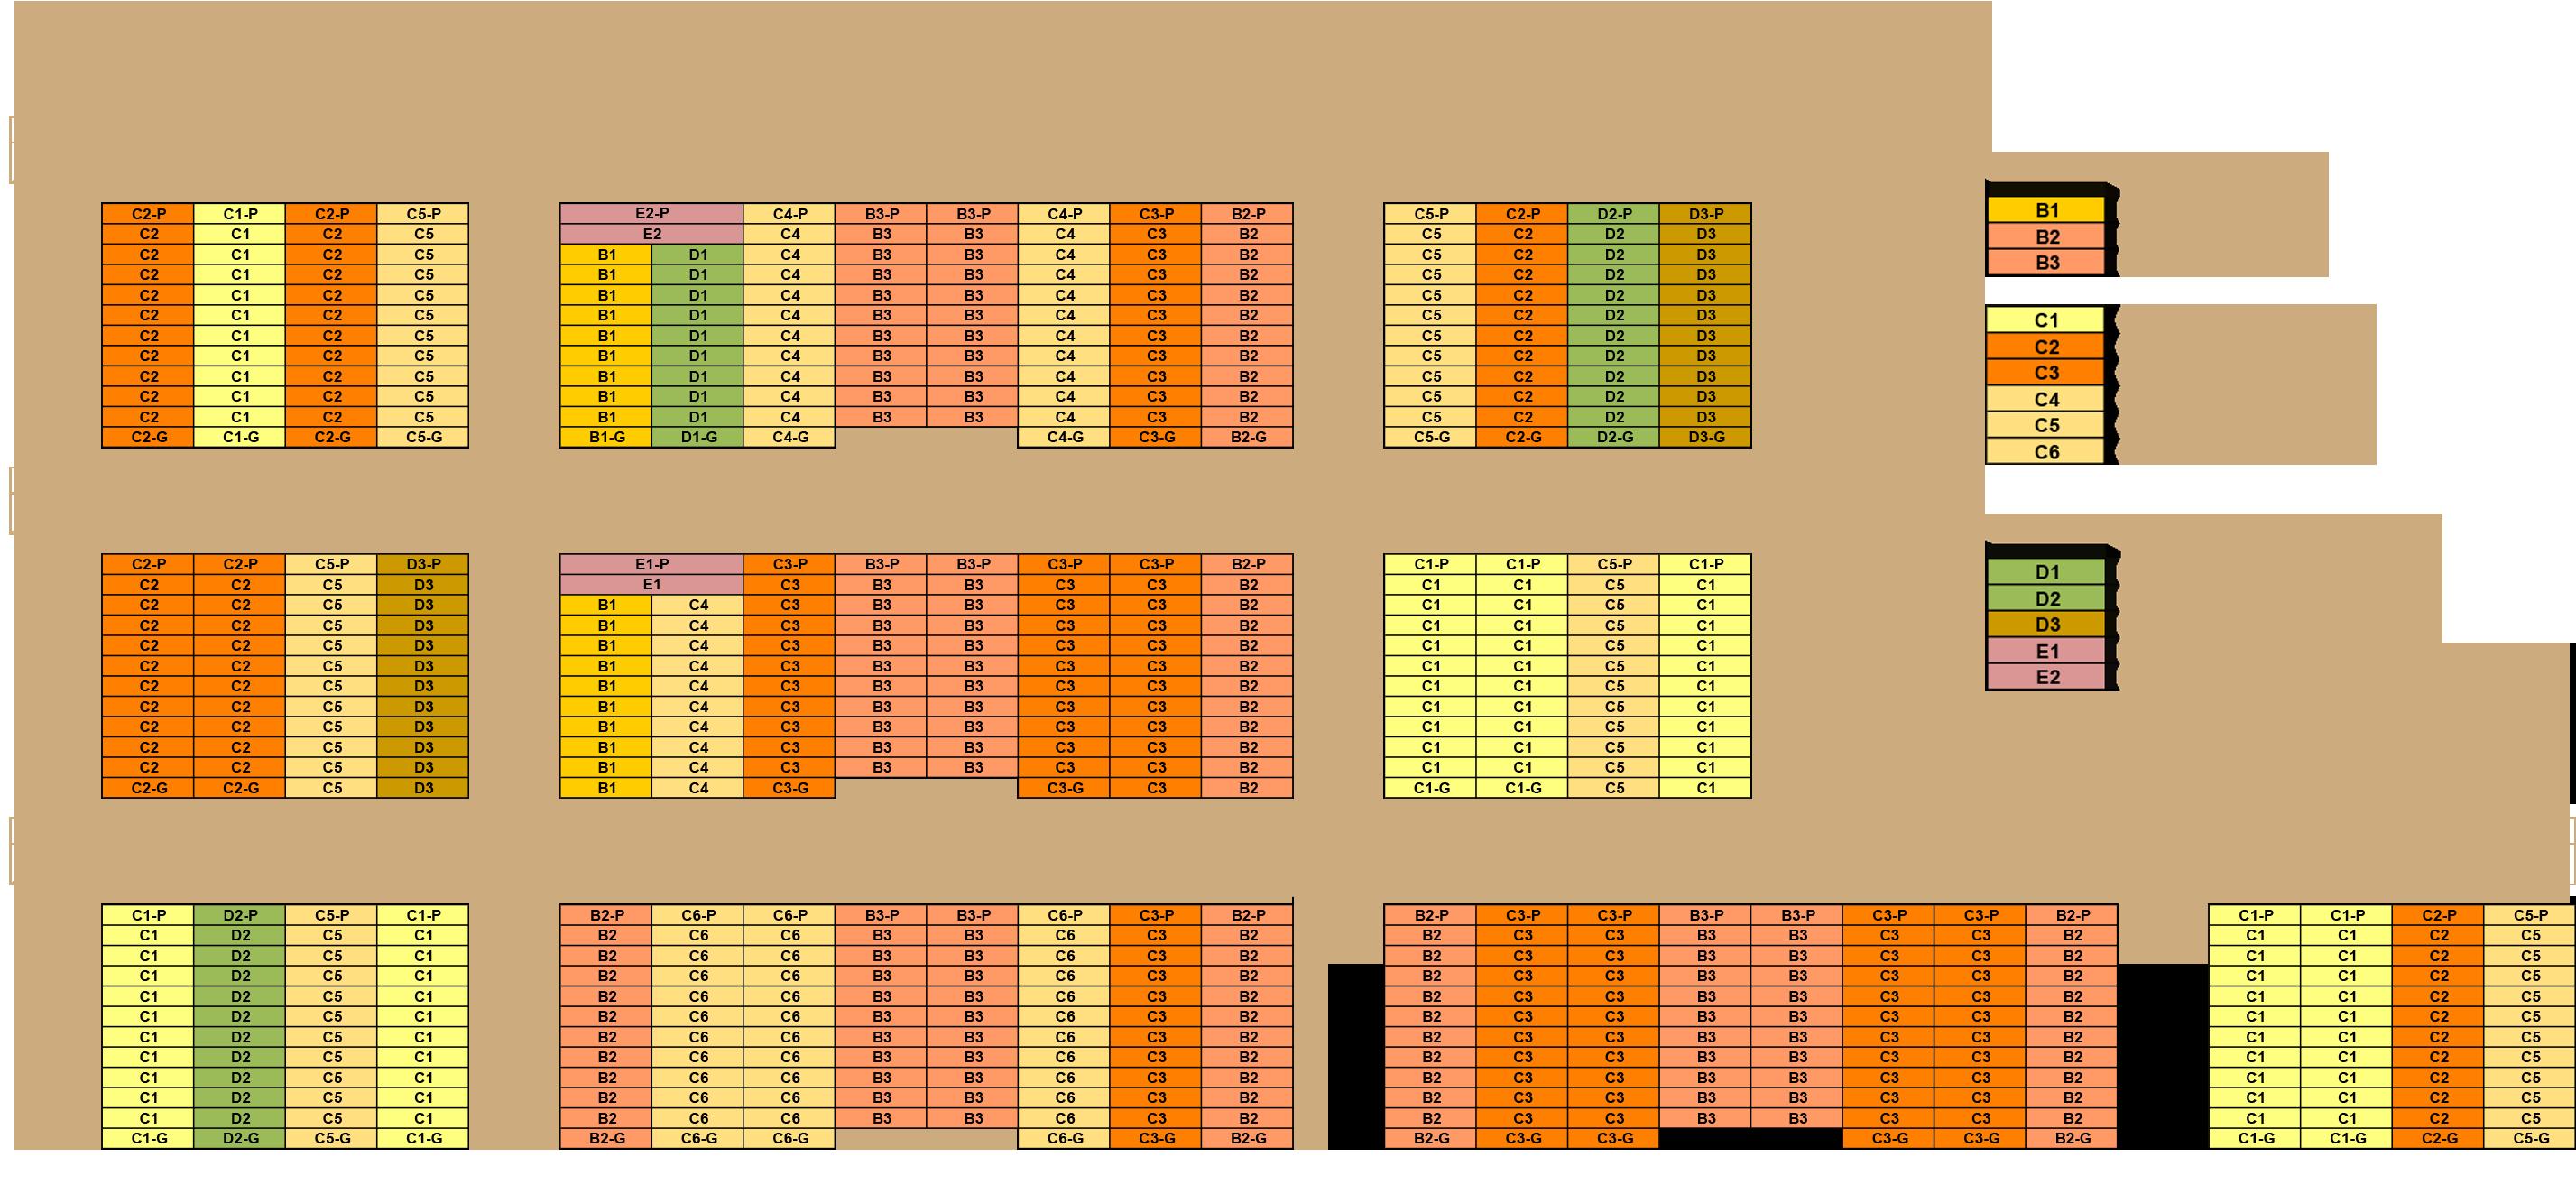 Ki Residences Elevation Chart 21102020